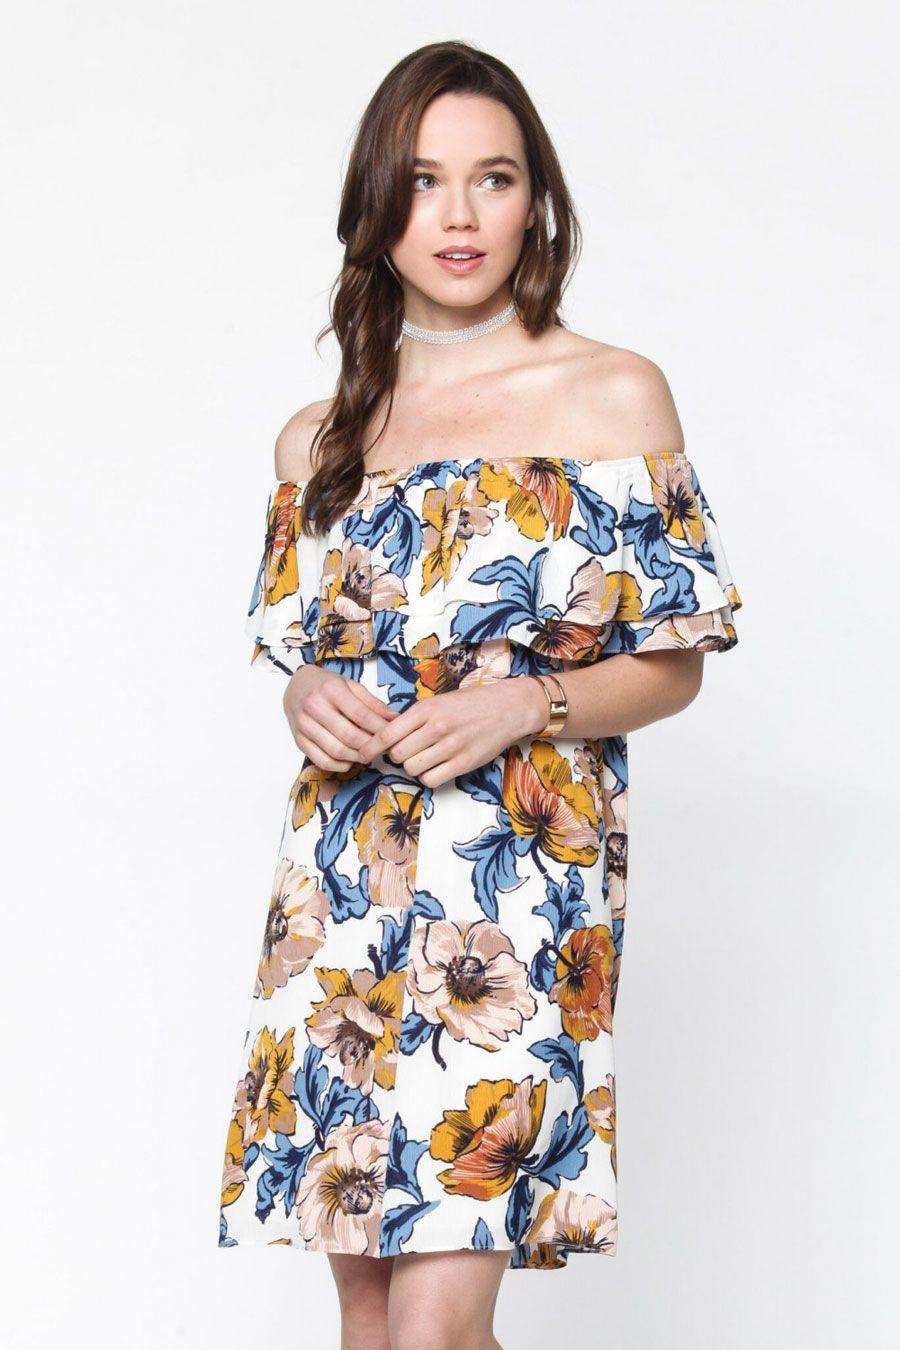 197c44bce63 Everly Clothing Off the Shoulder Floral Dress in Beige